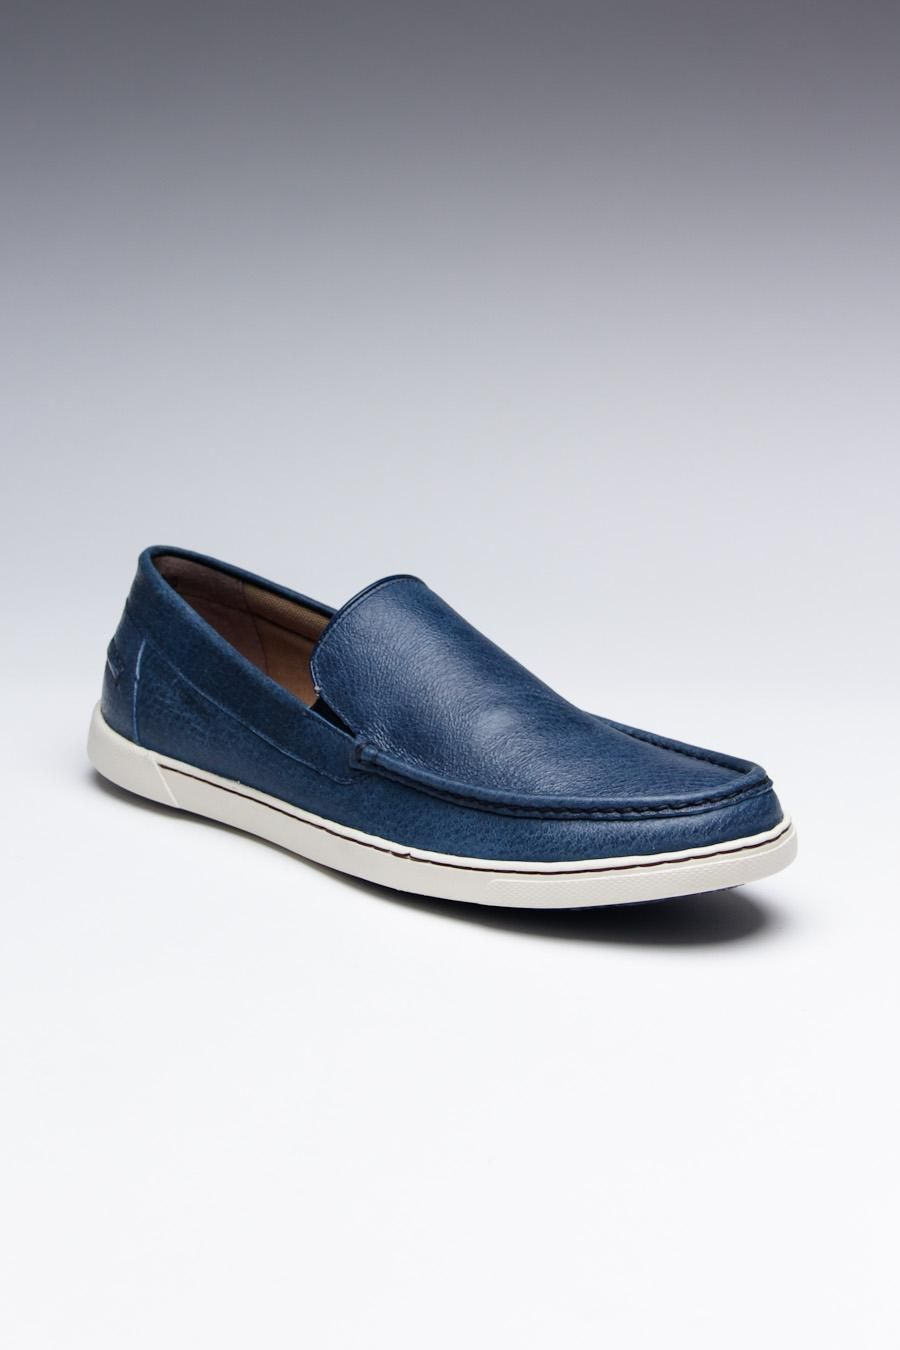 Hush Puppies Winns Shoe Dress Shoes Men Loafers Men Mens Outfits